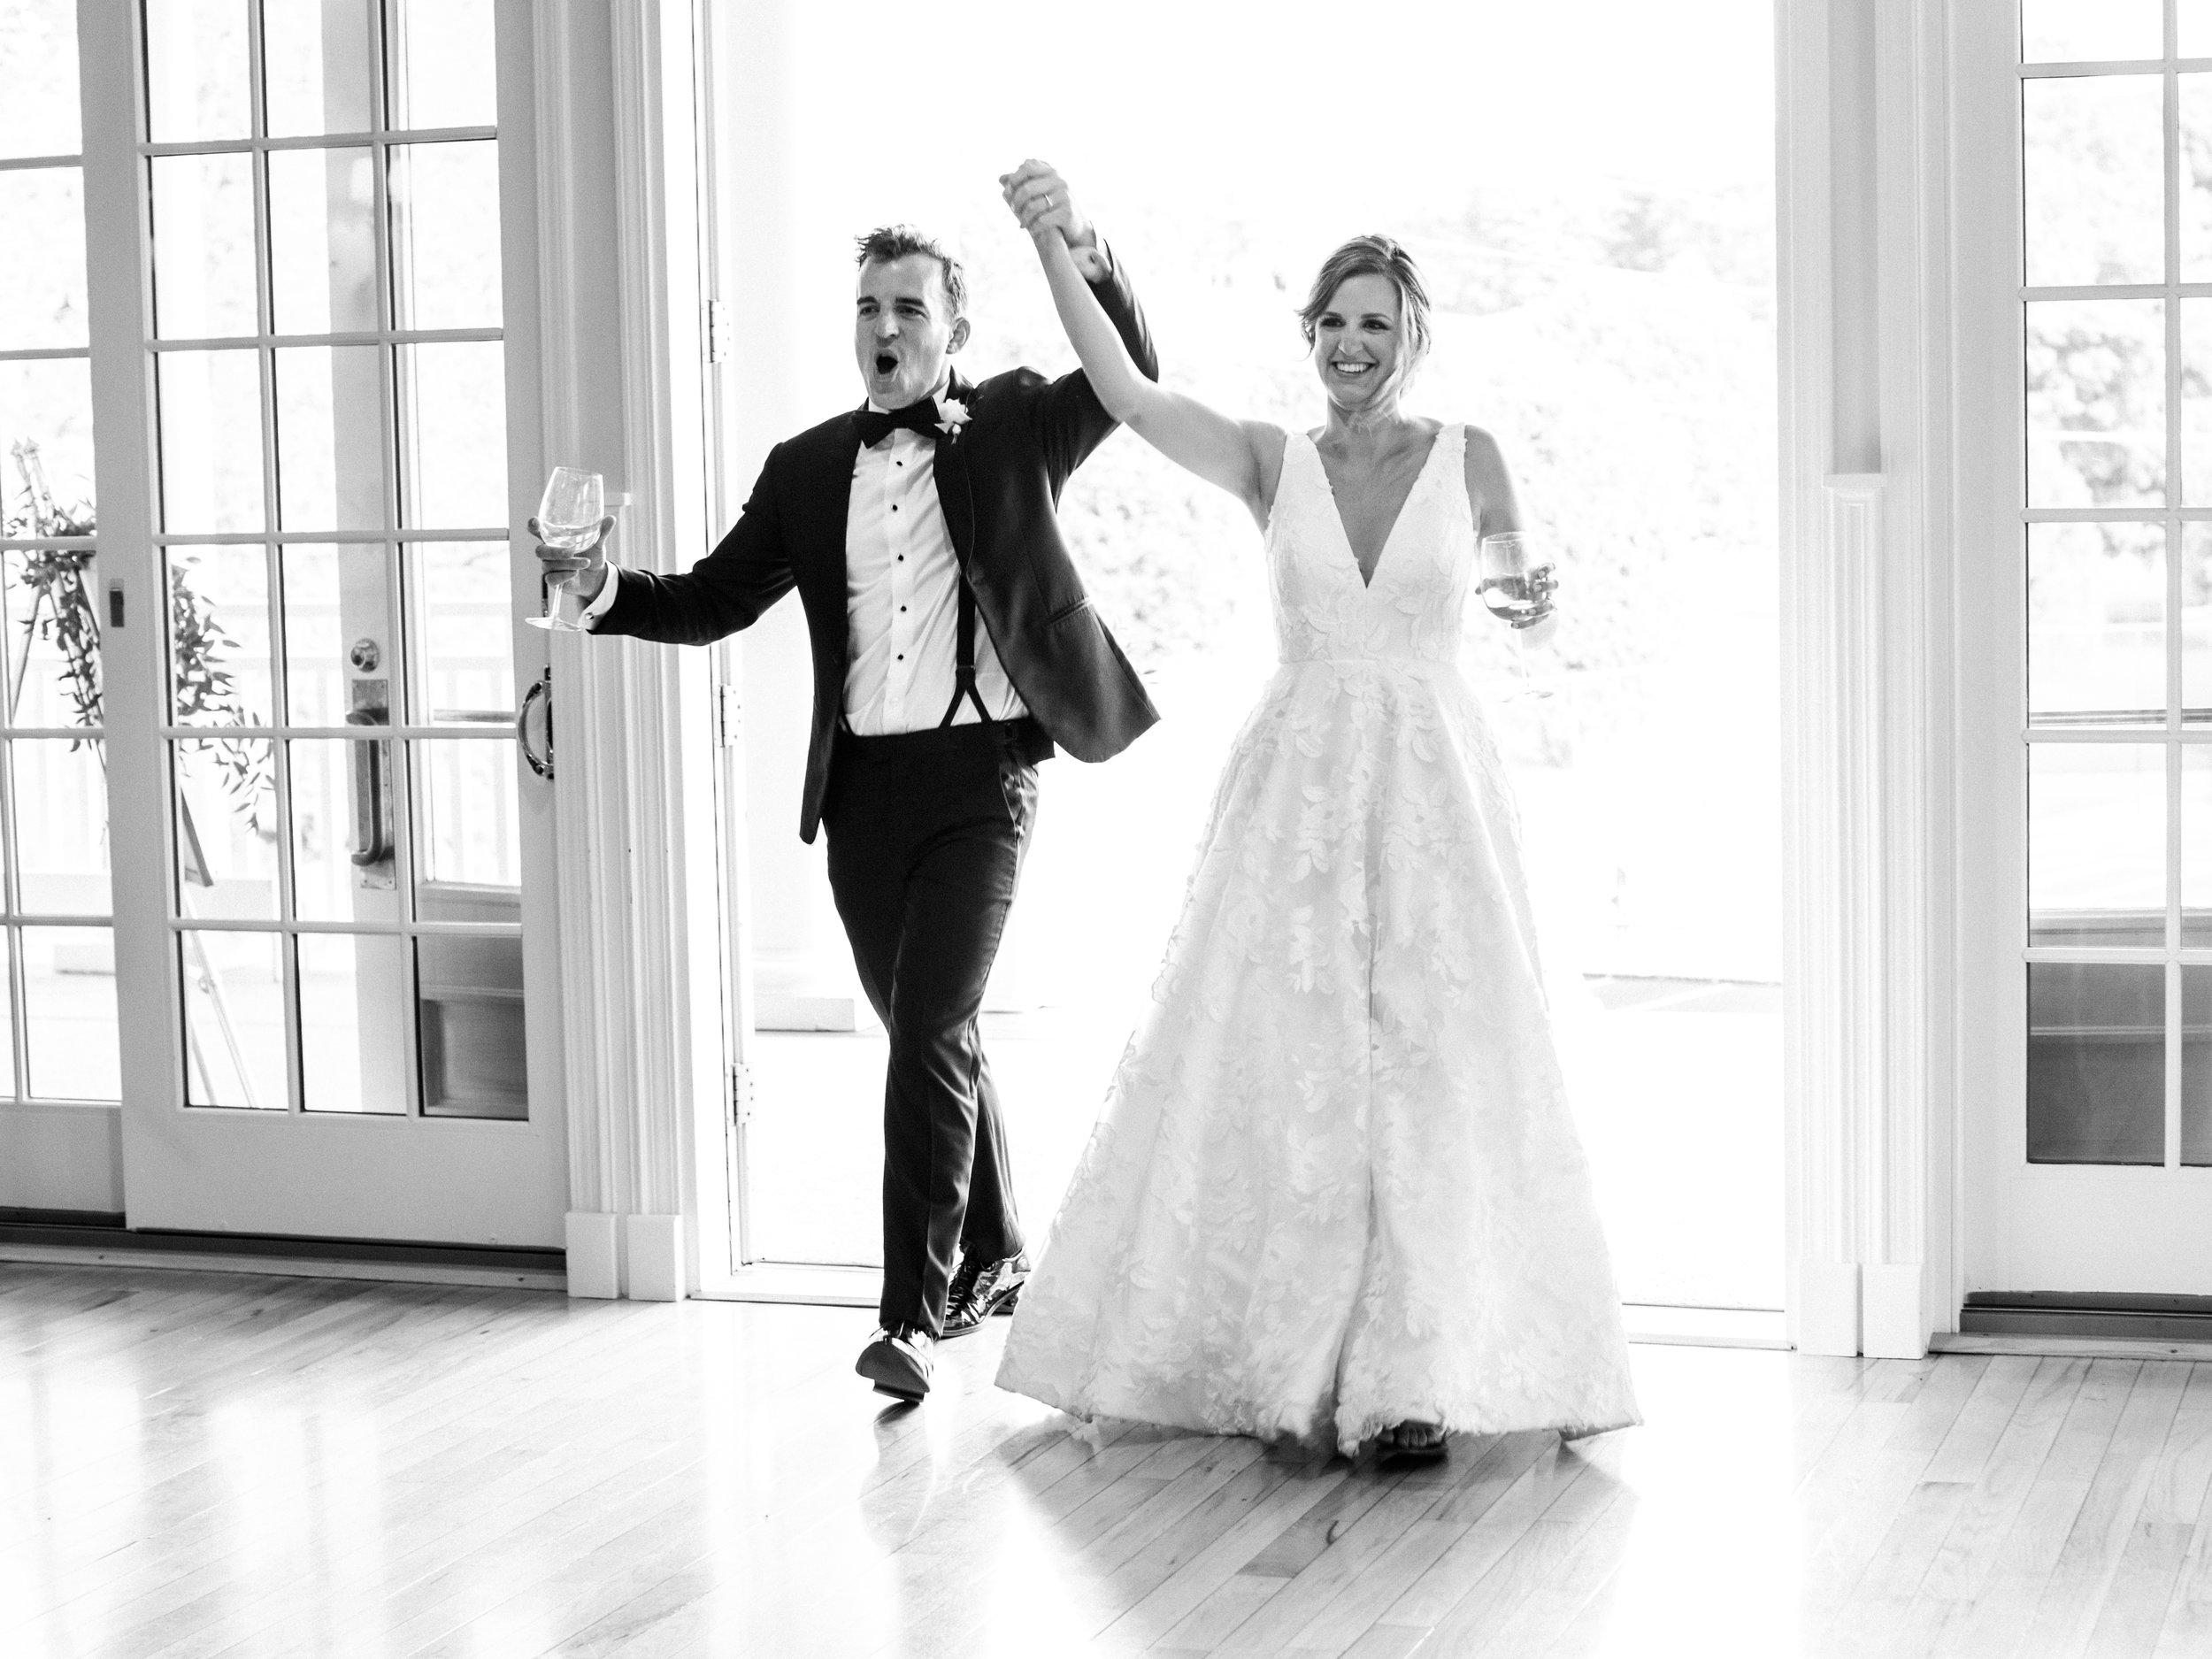 DeGuilio+Wedding+Reception-13.jpg